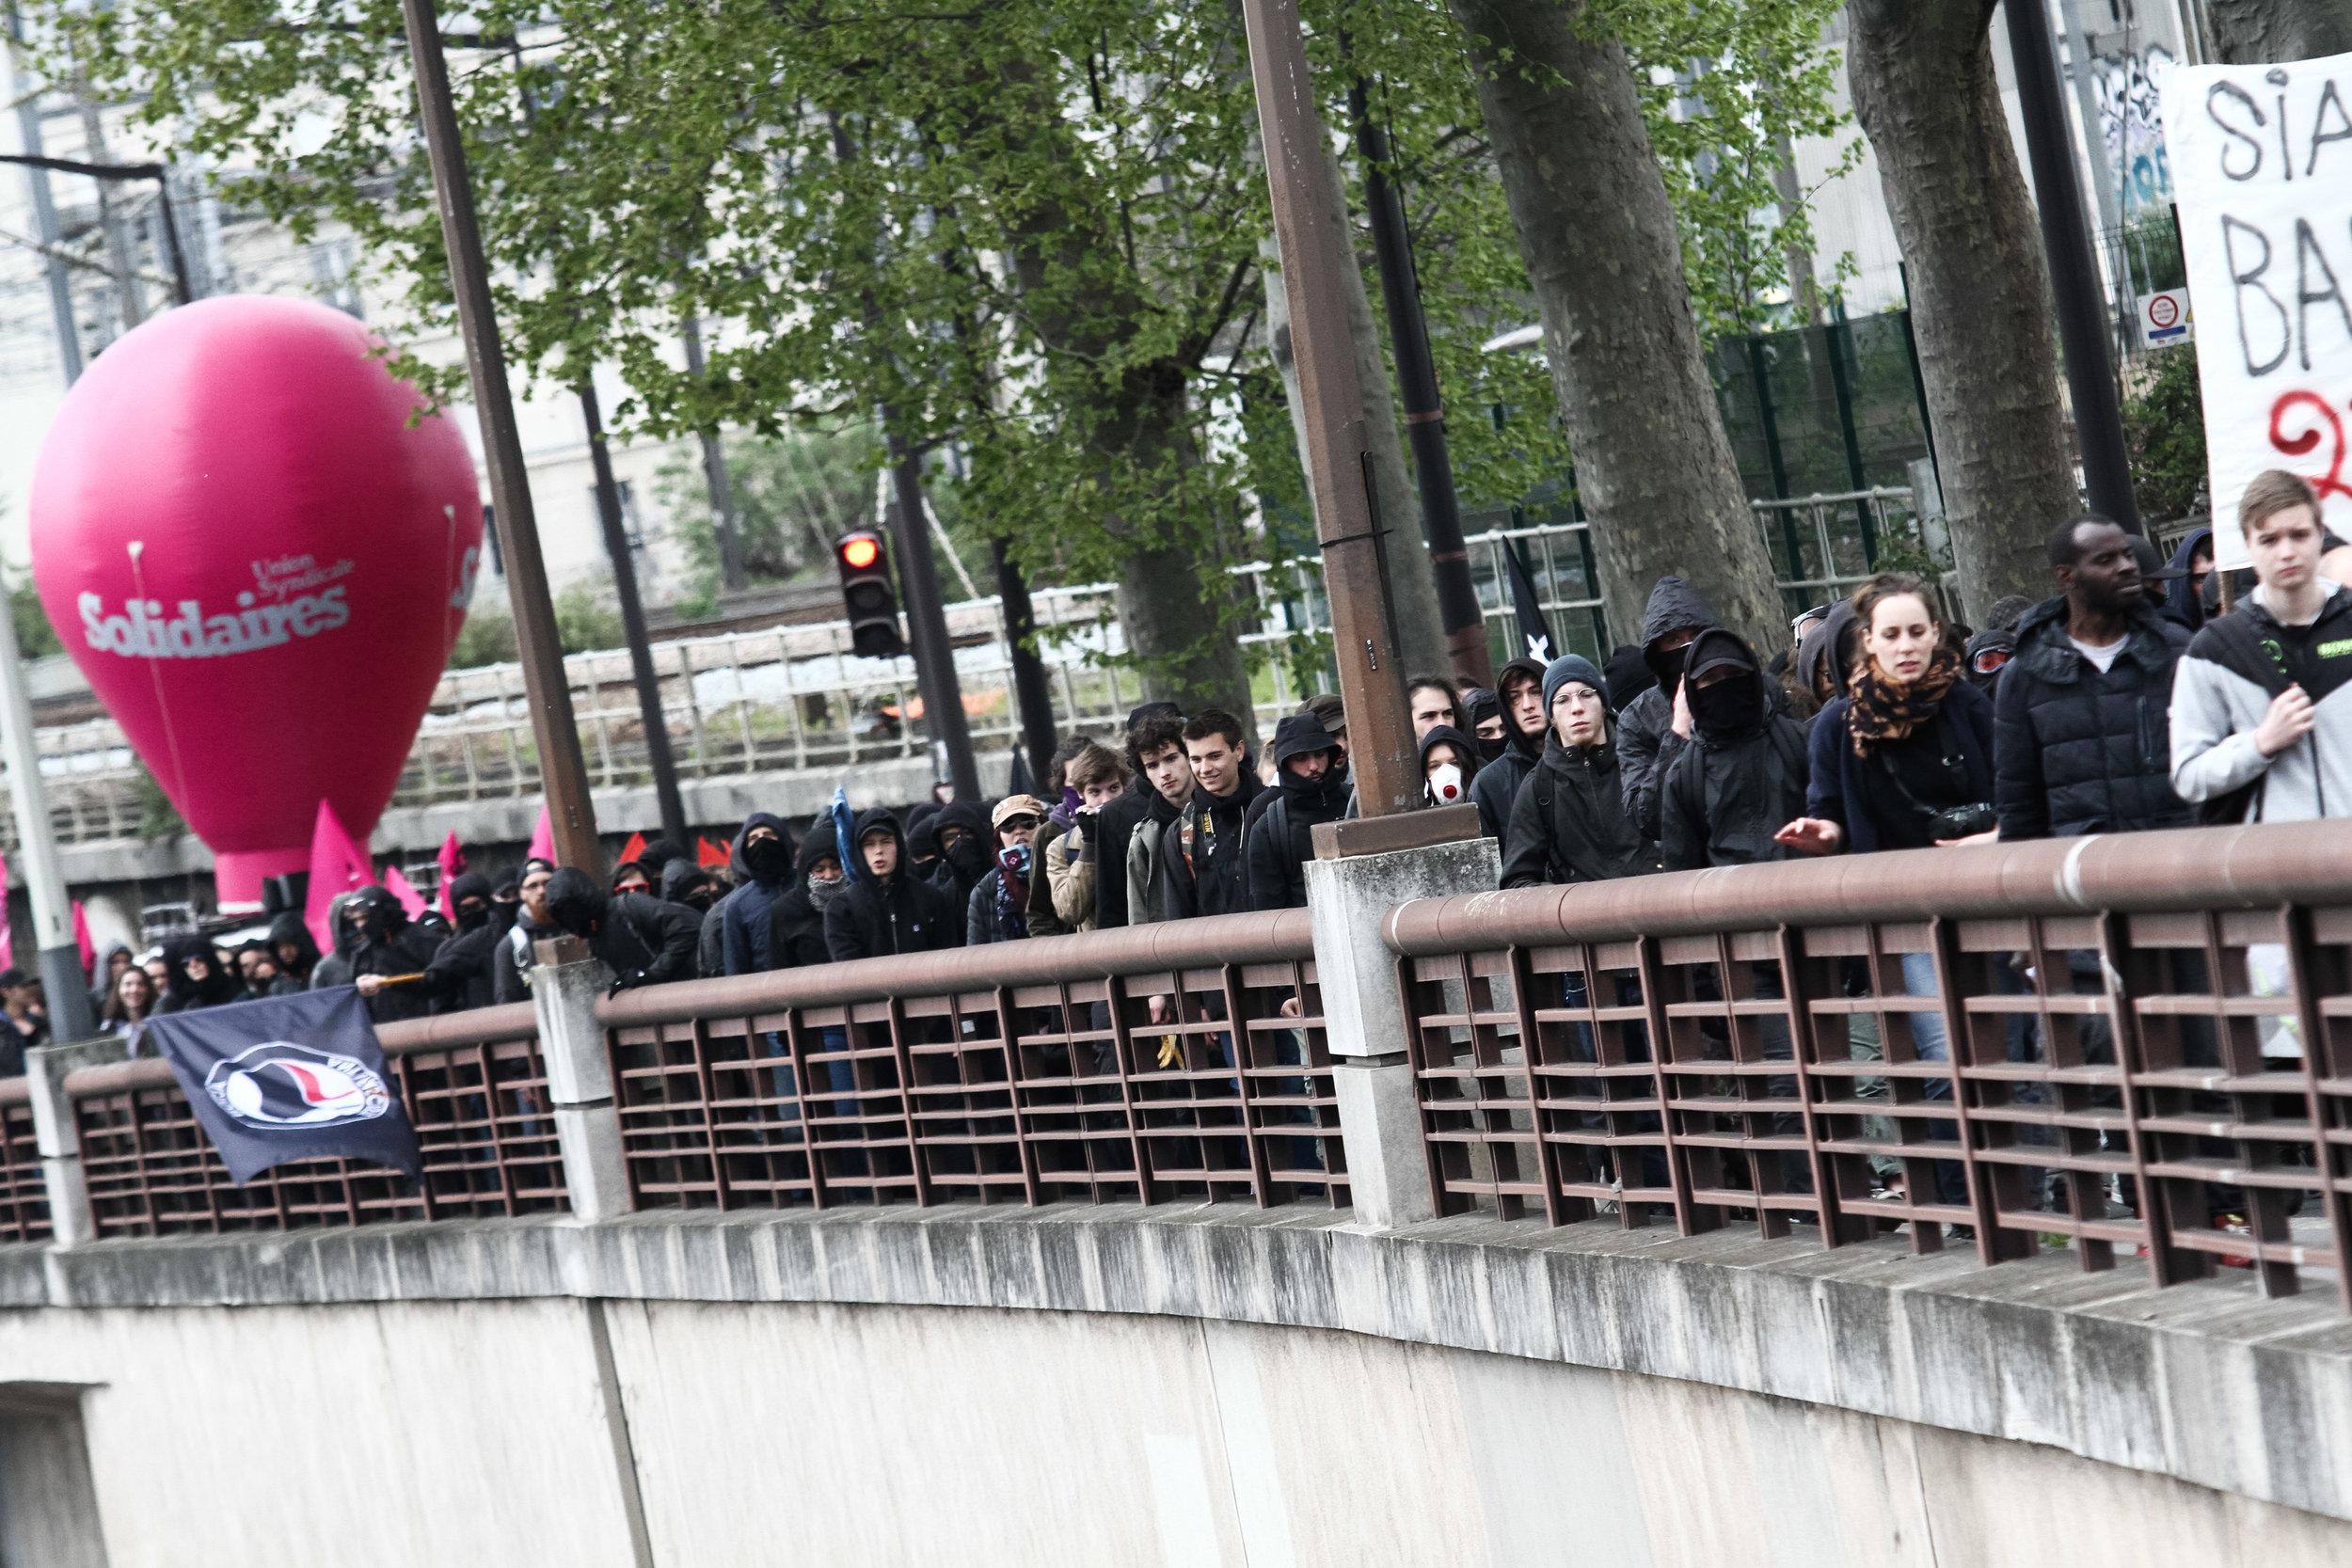 40-20170416-MANIFESTATION-ANTIFA-PARIS©Augustin-Le_Gall-Haytham-Pictures-IMG_4834.jpg